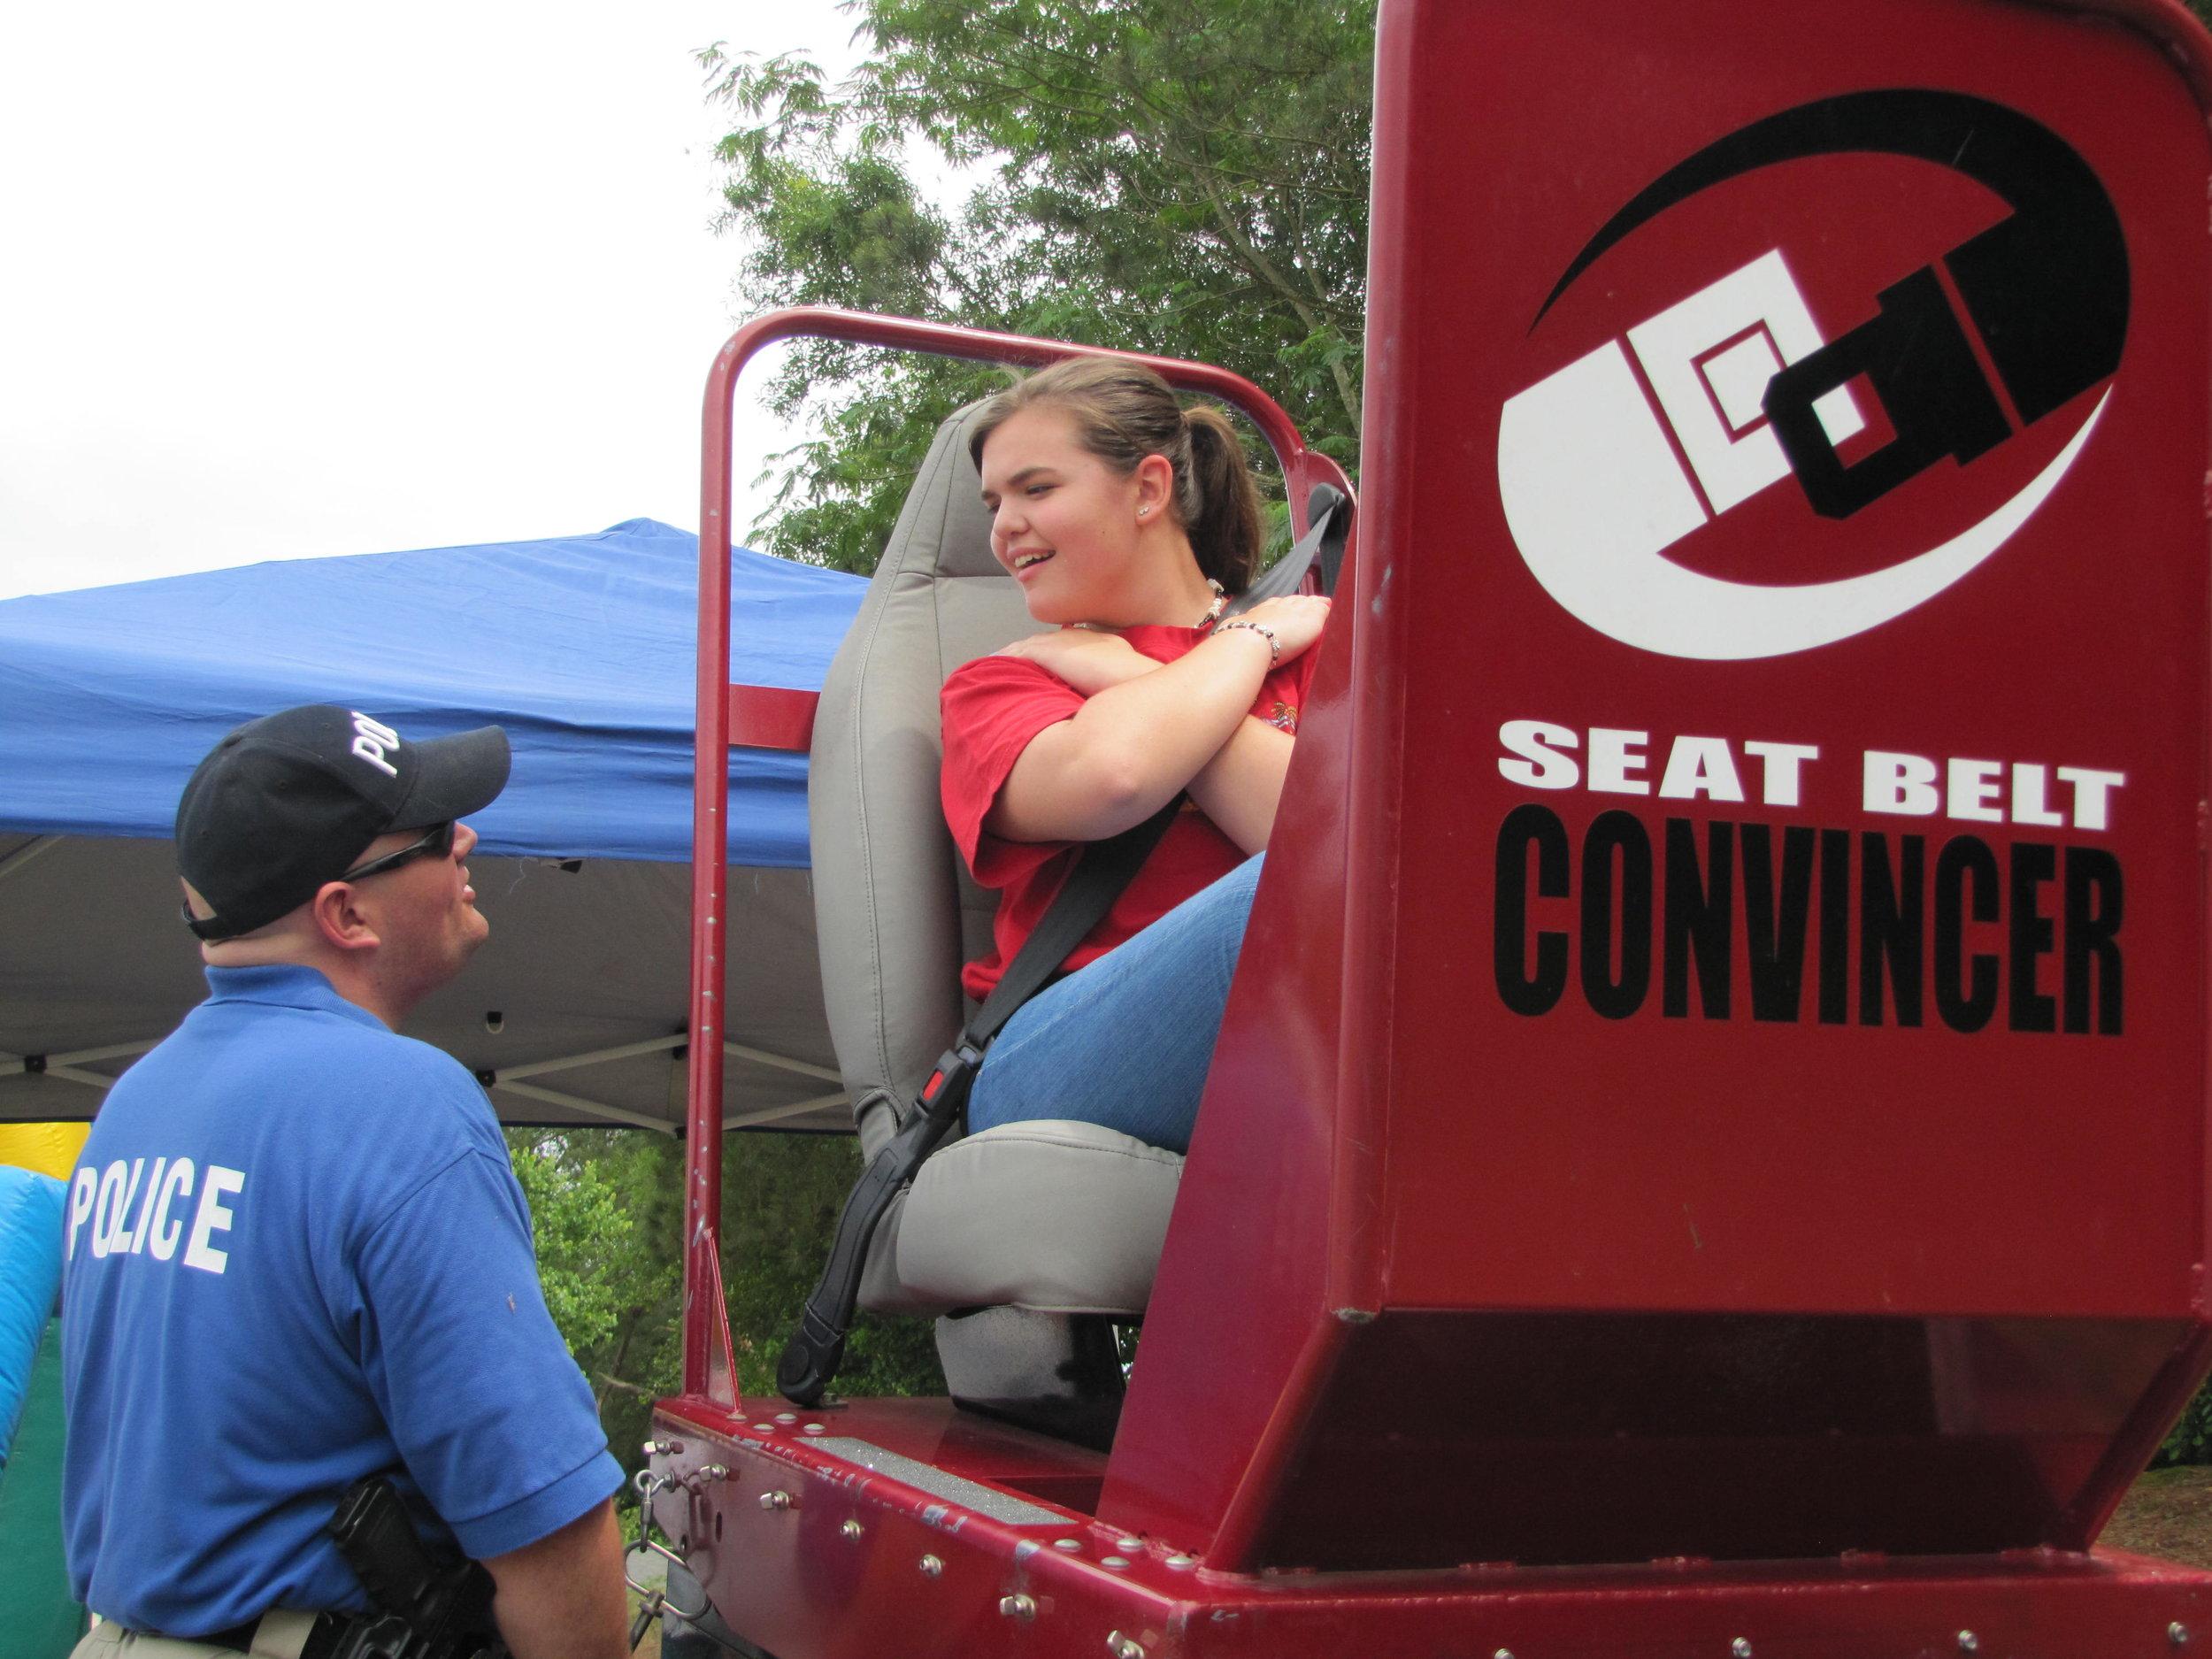 Seat Belt Convincer 5.jpg